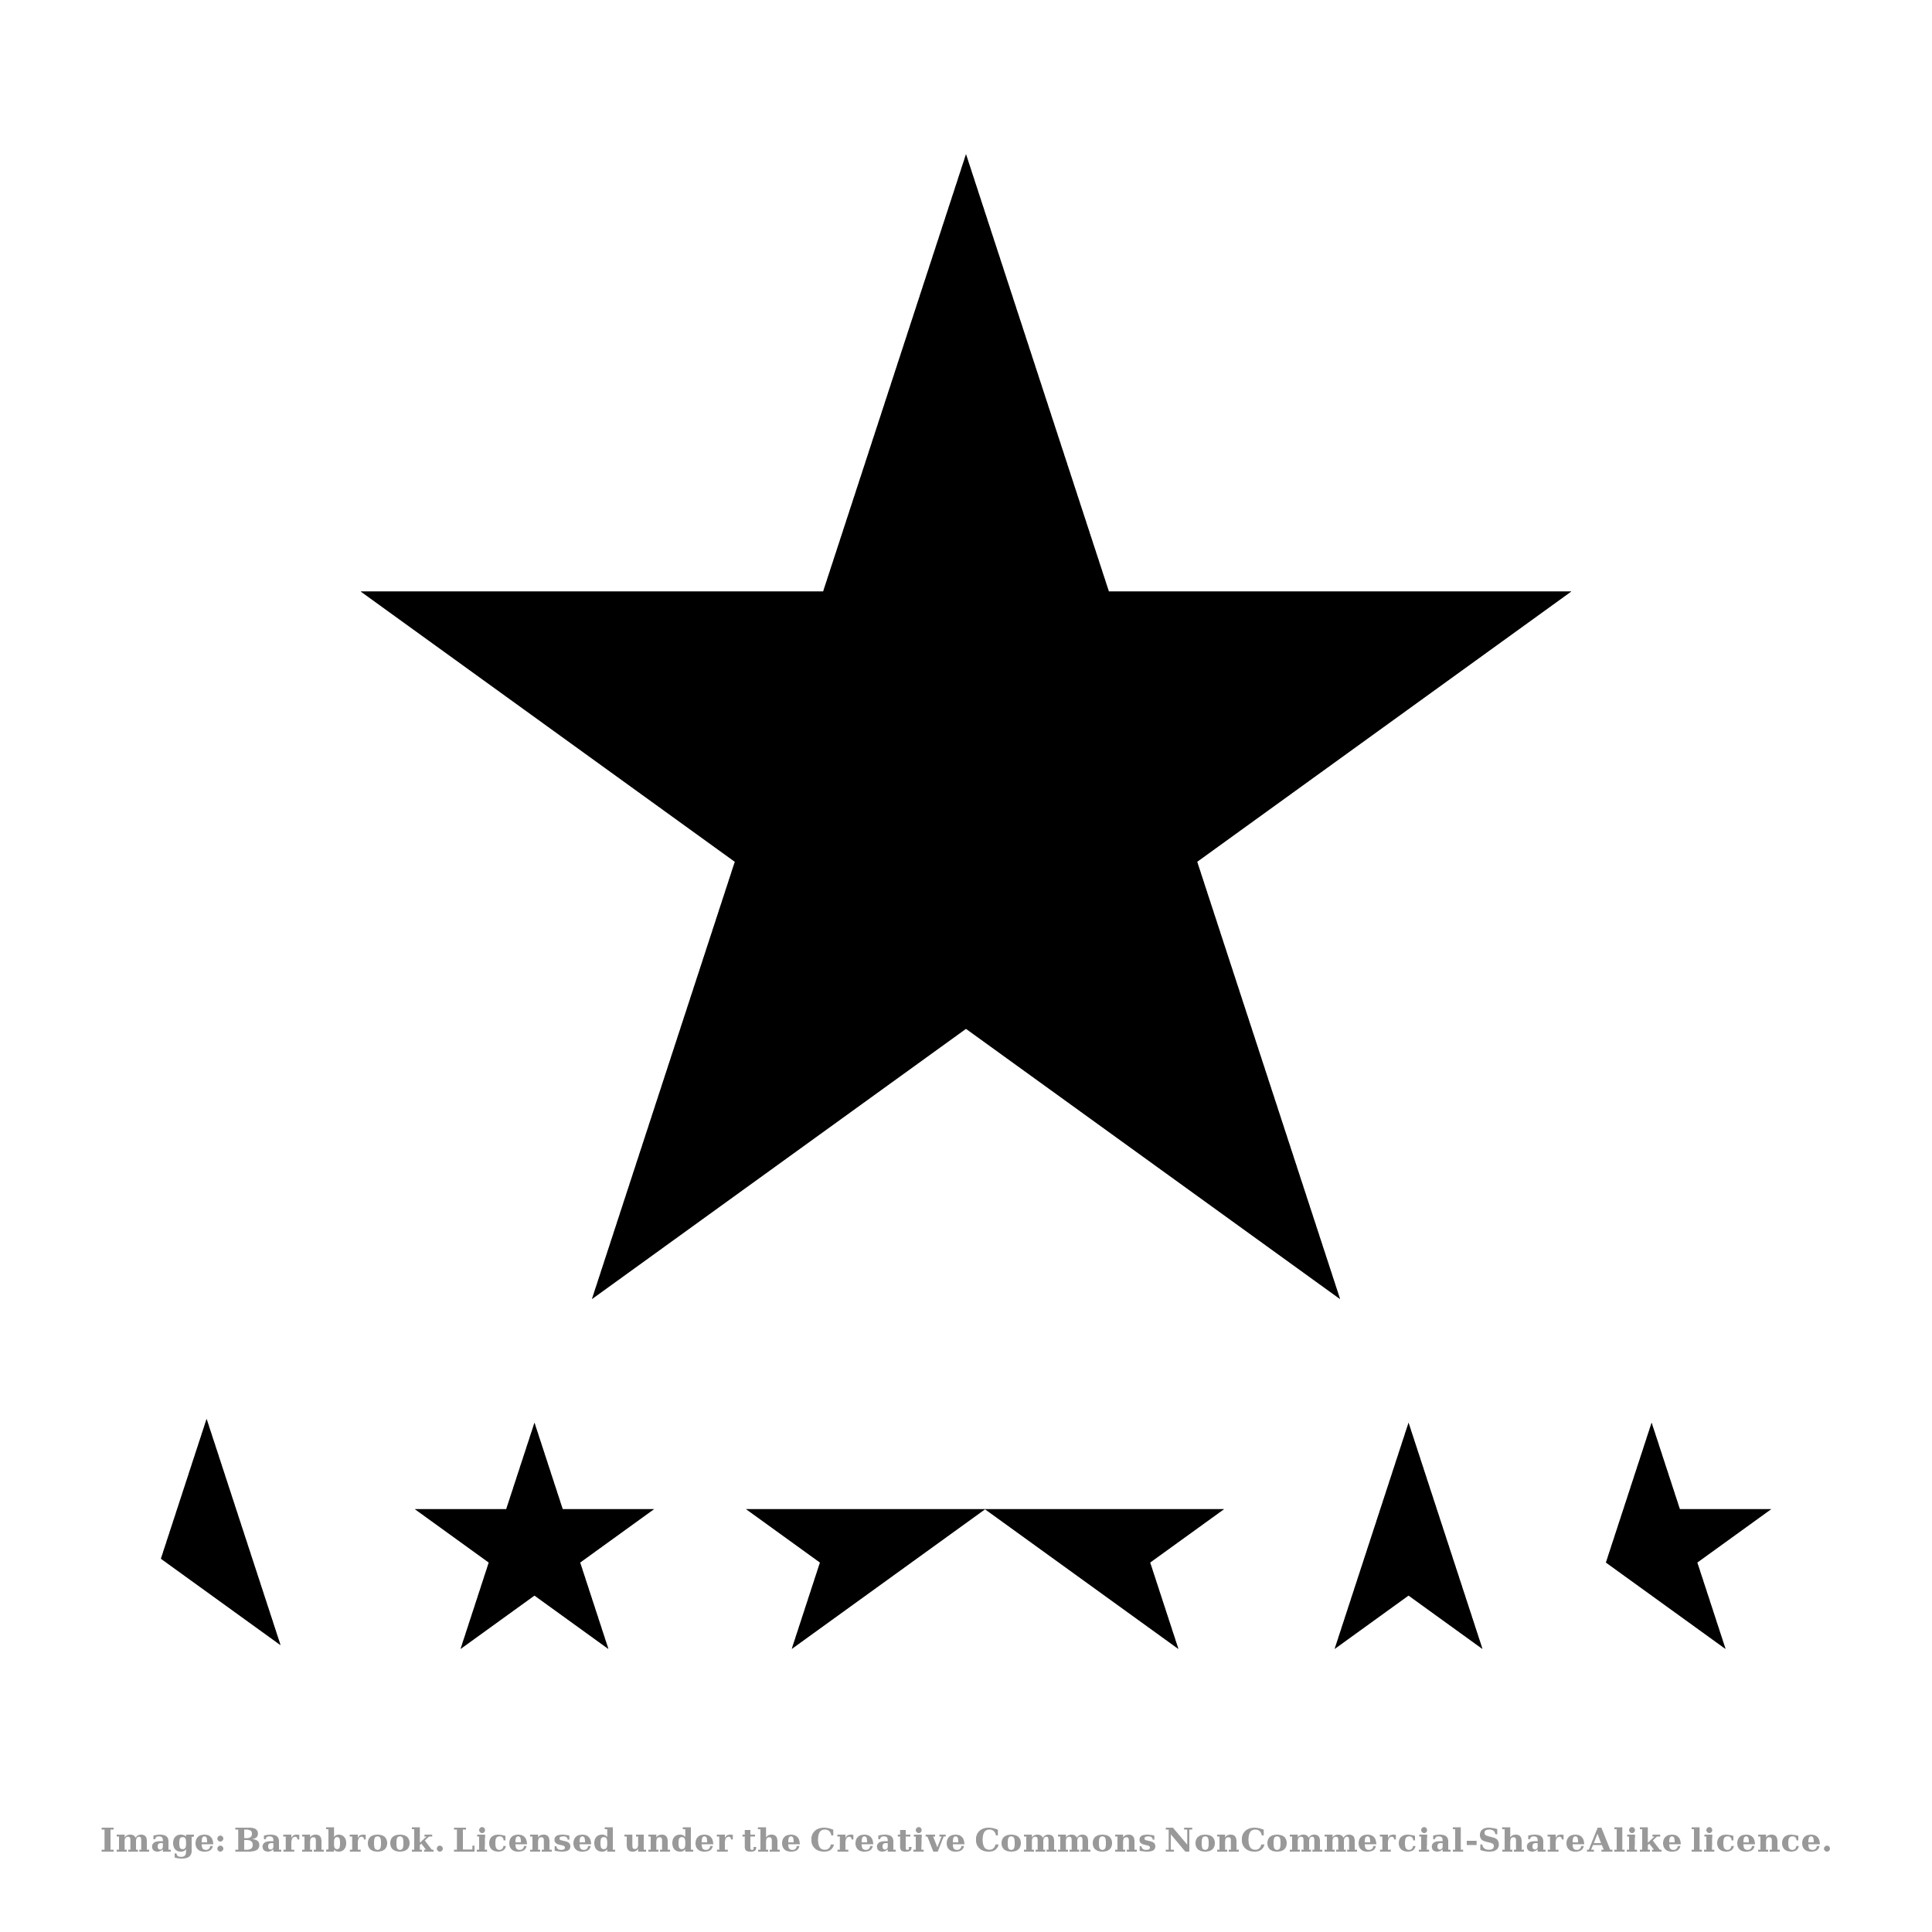 Bowie_Blackstar_1